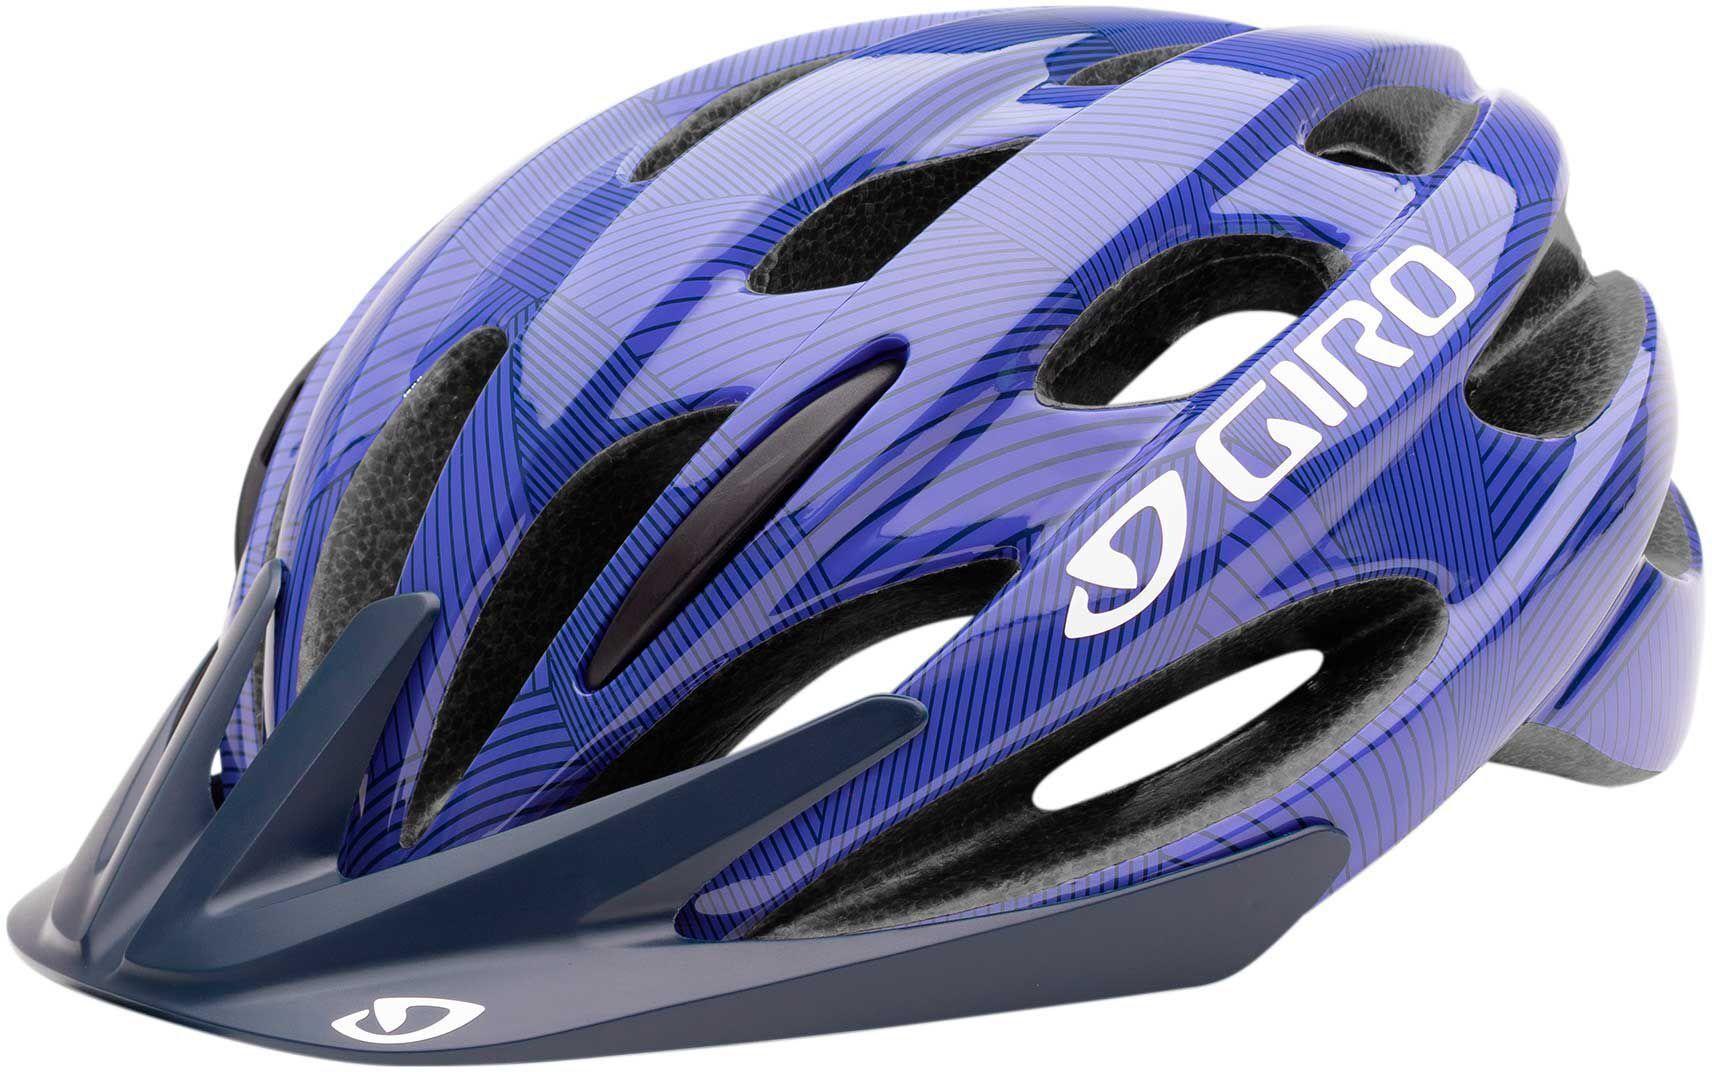 Giro Women's Verona Bike Helmet, Midnight/Electric Purple